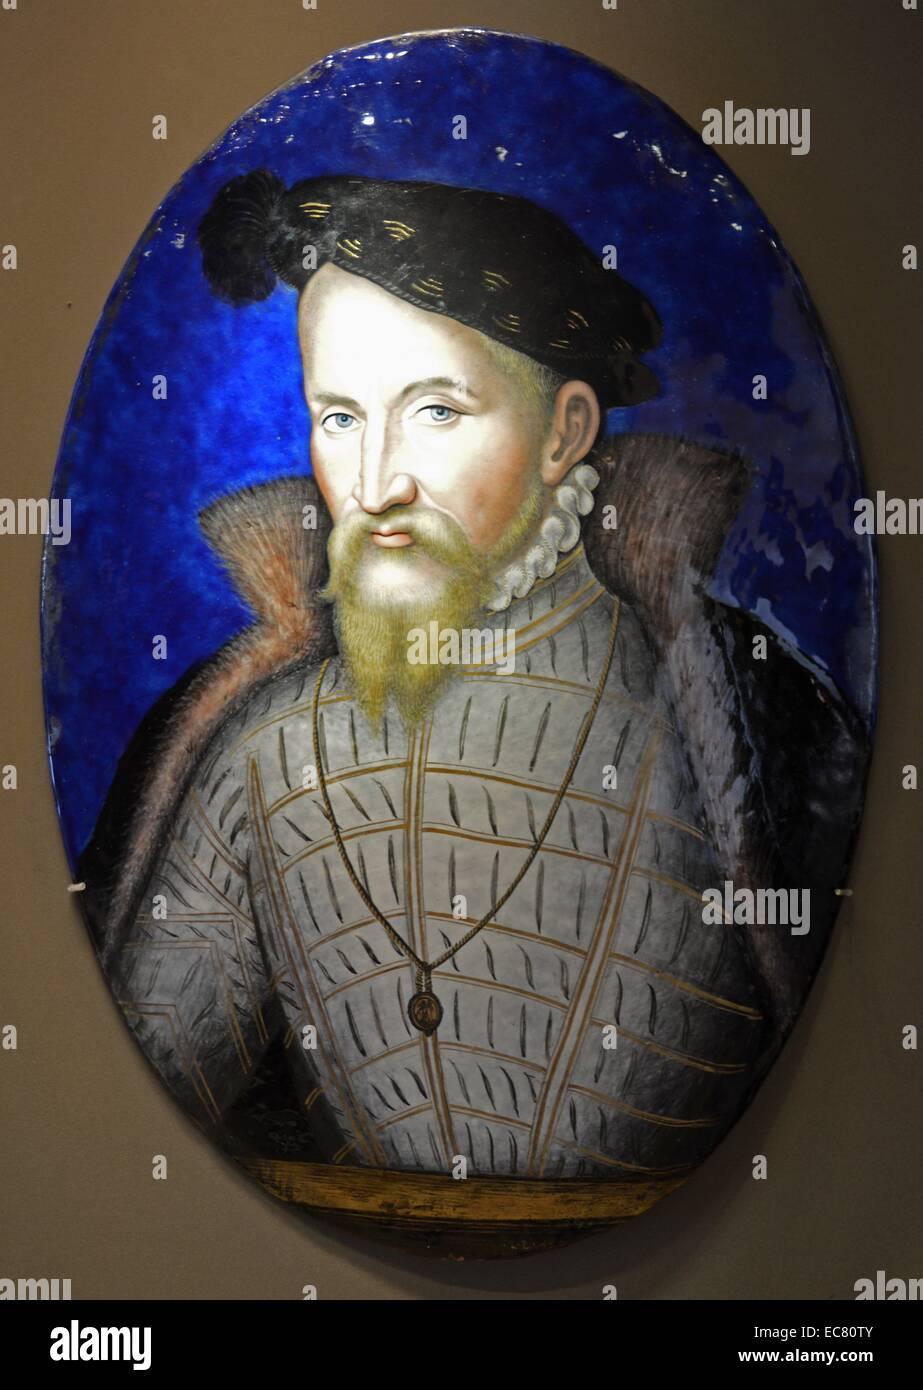 Copper plate enamelled by Leonard Limosin - Stock Image